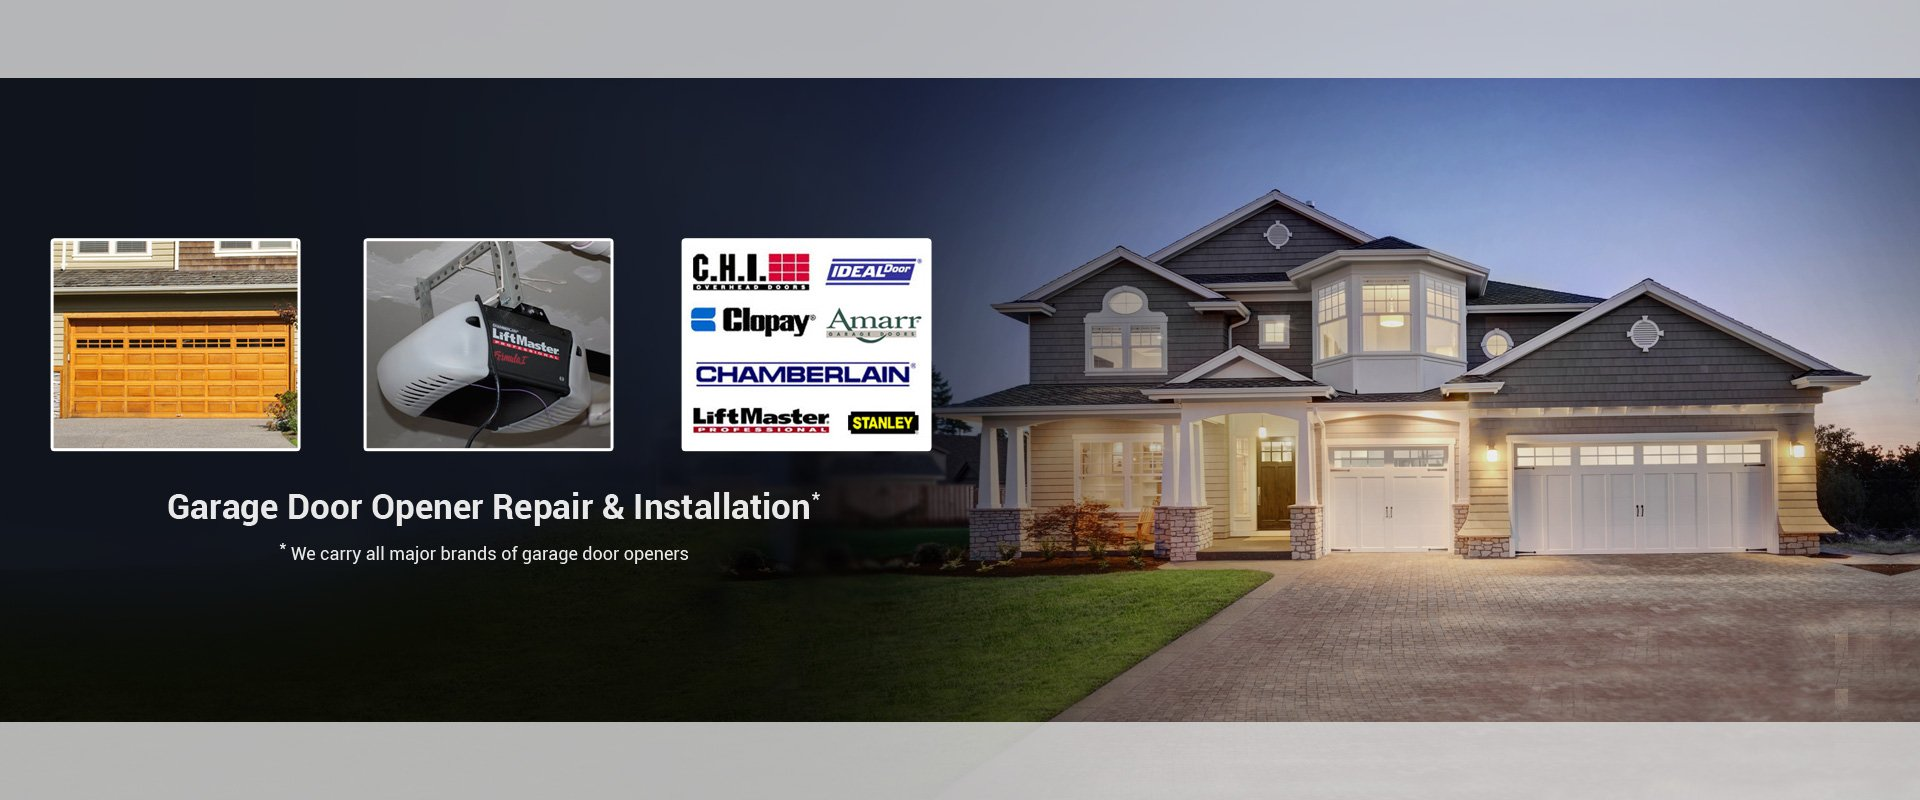 Garage Door Opener Repair And Installation Services Camarillo CA